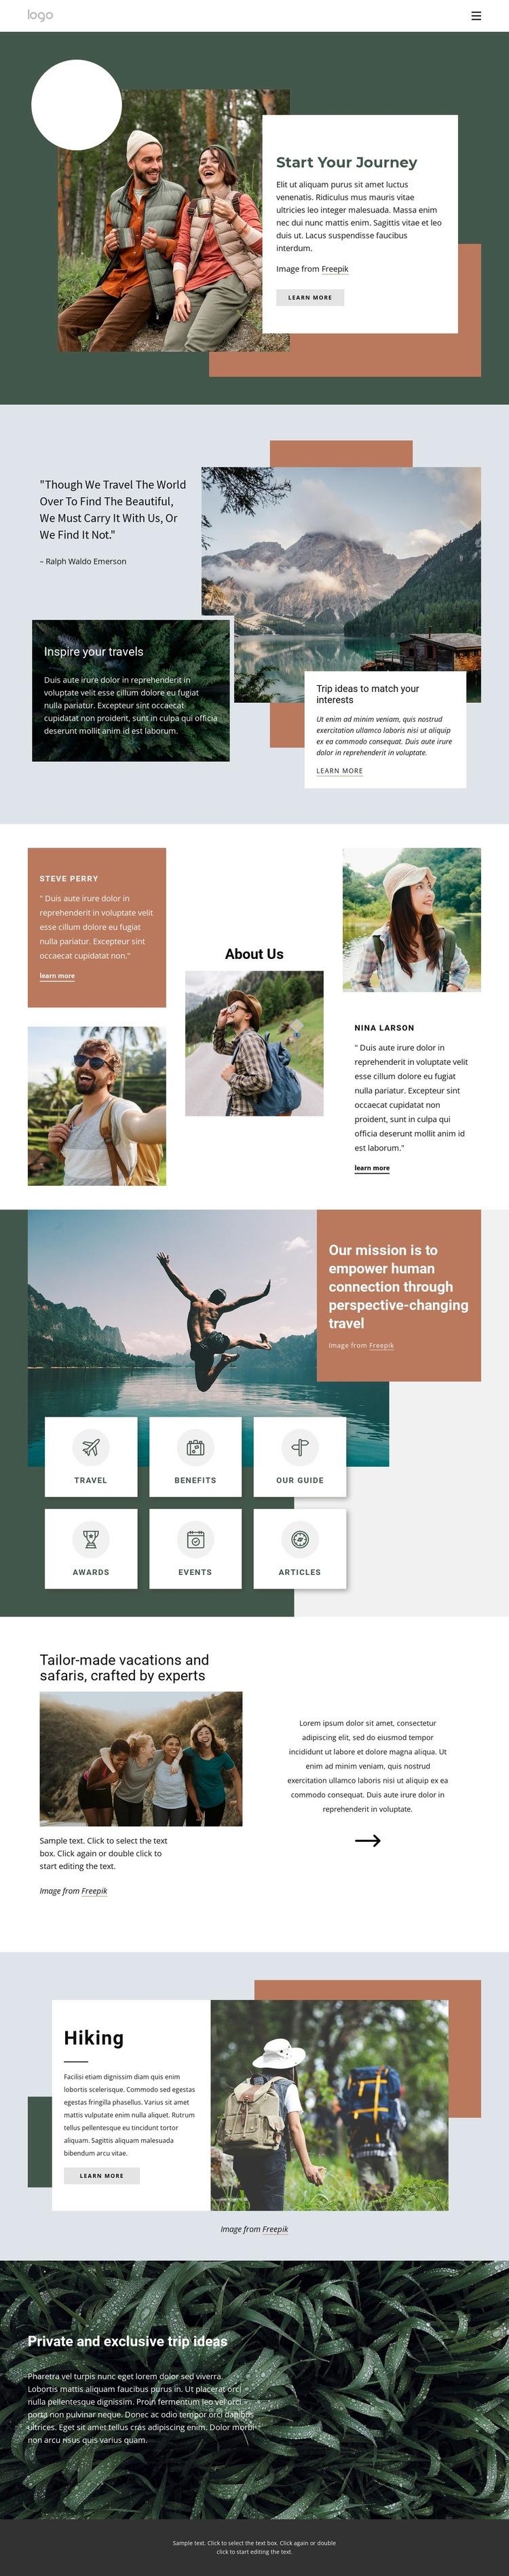 Adventure travel company Web Page Designer